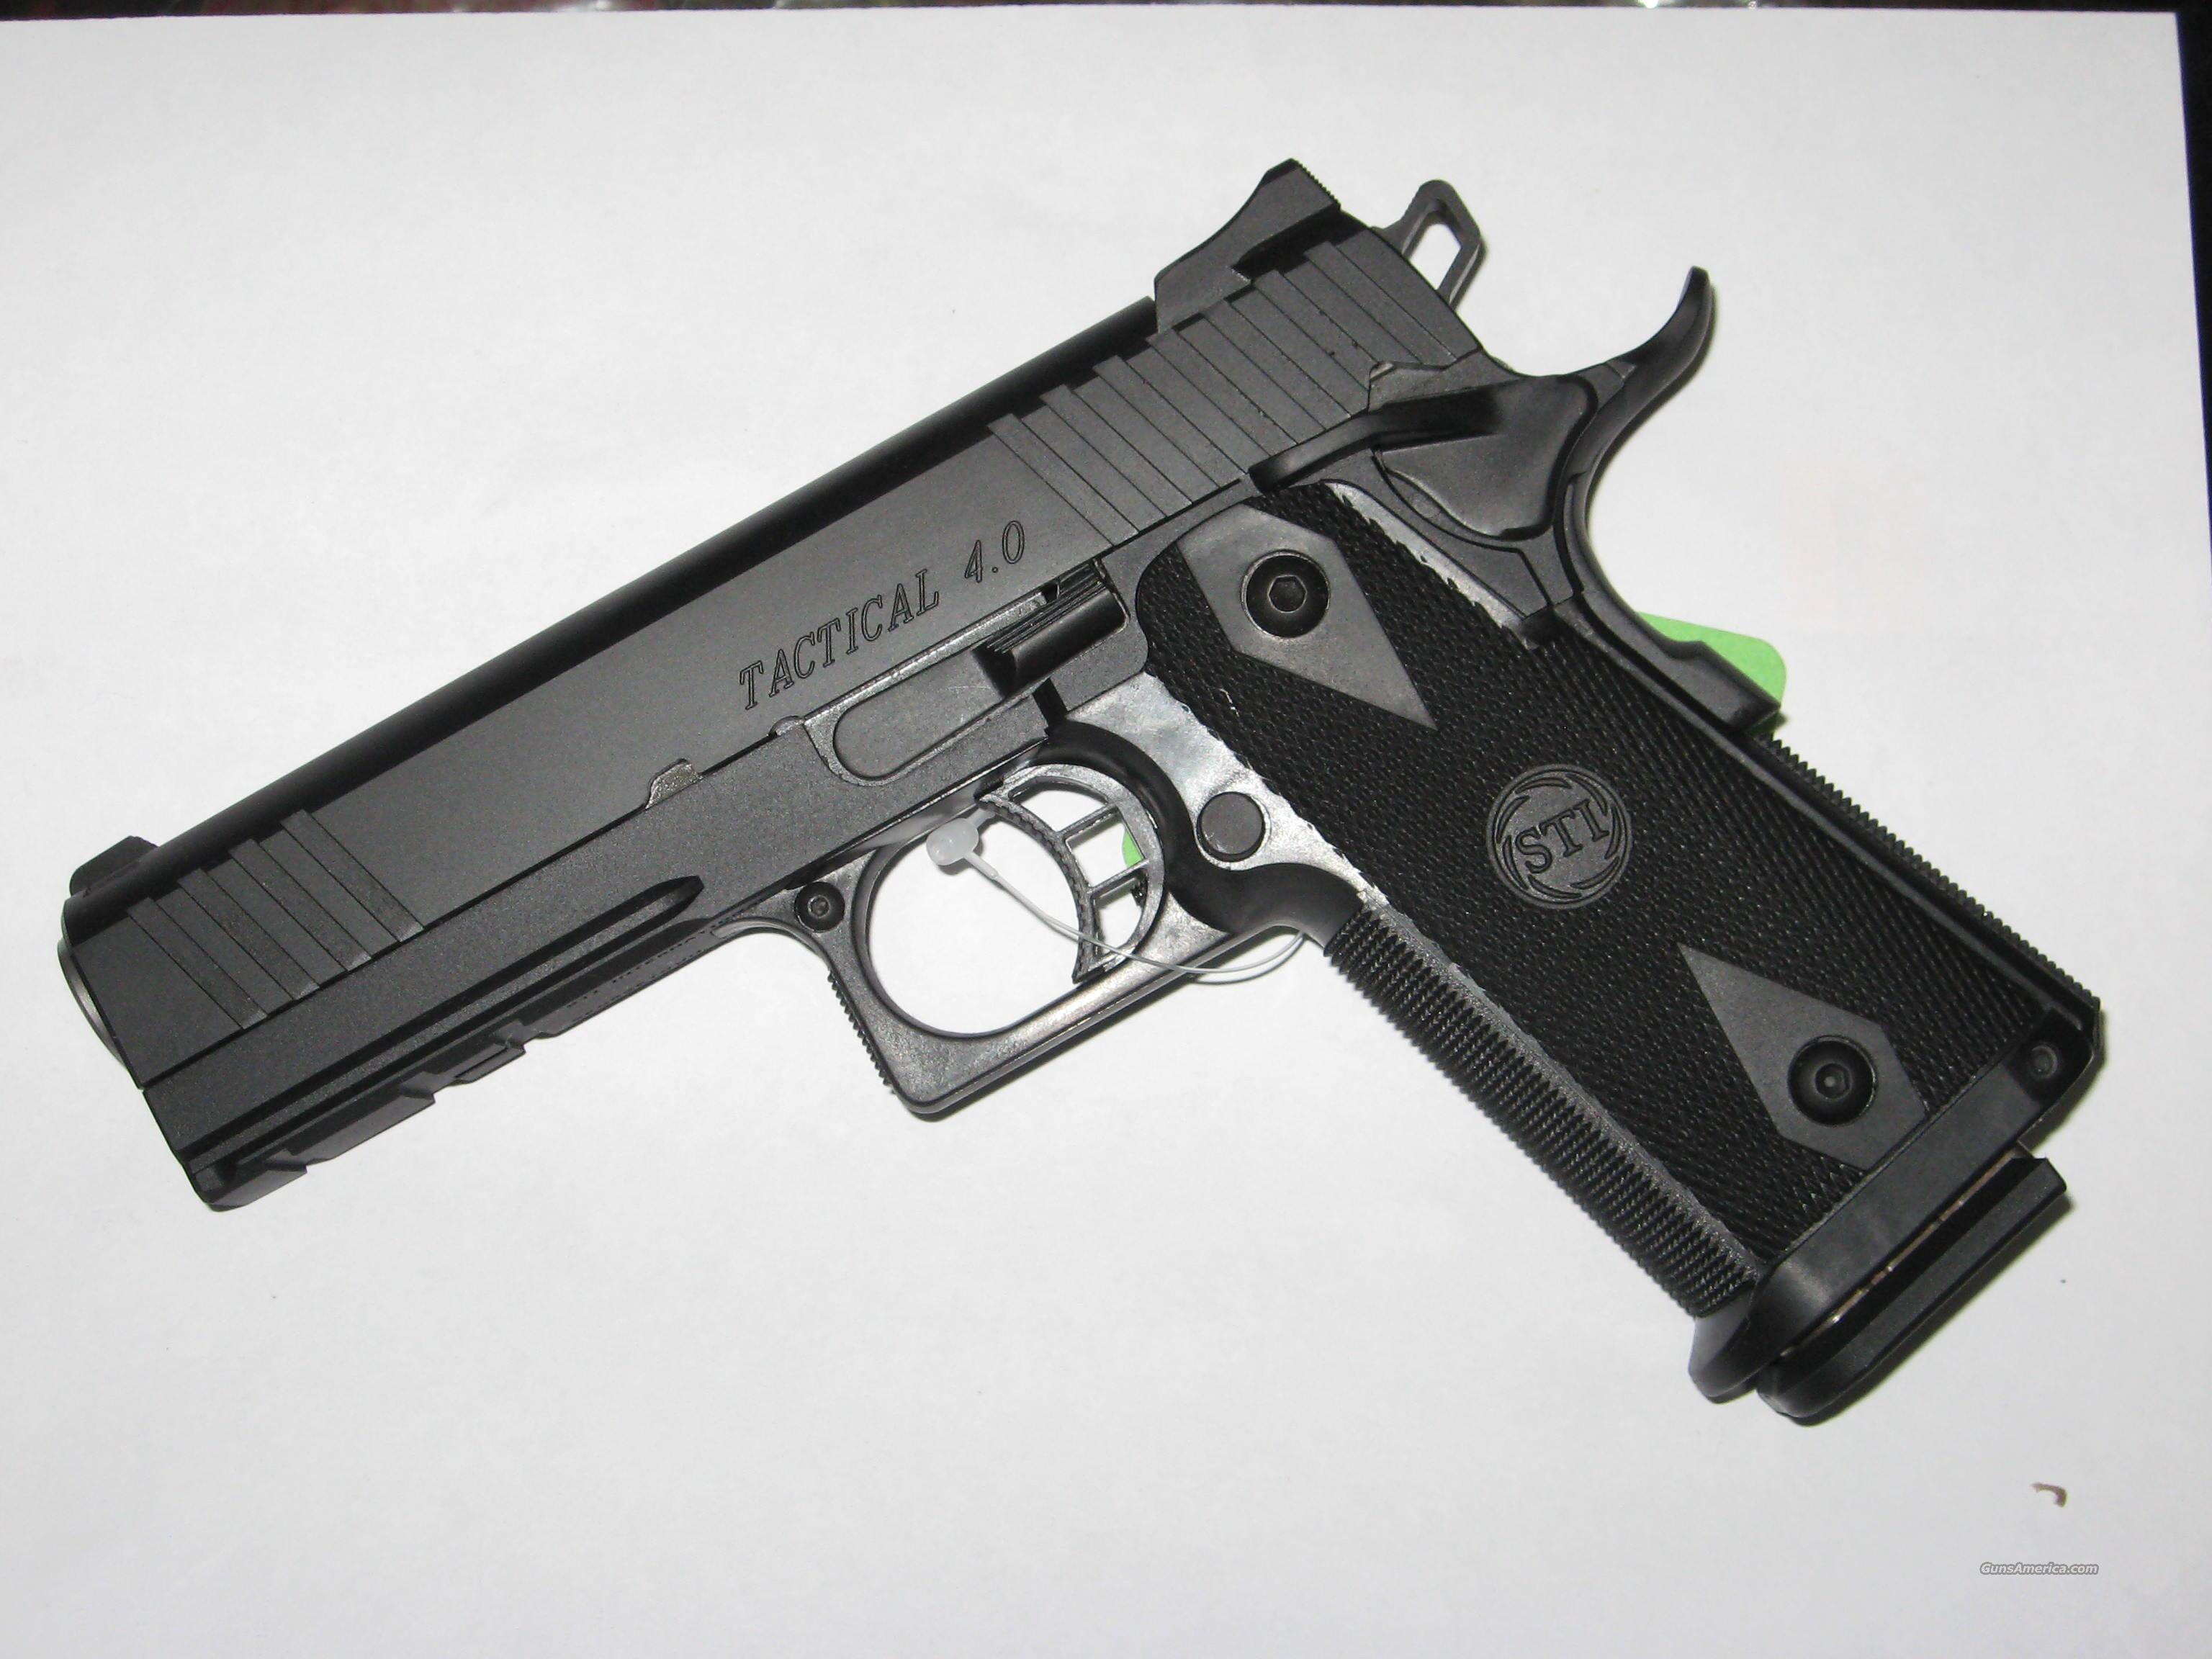 STI Tactical 4.0 in 45 ACP  Guns > Pistols > STI Pistols